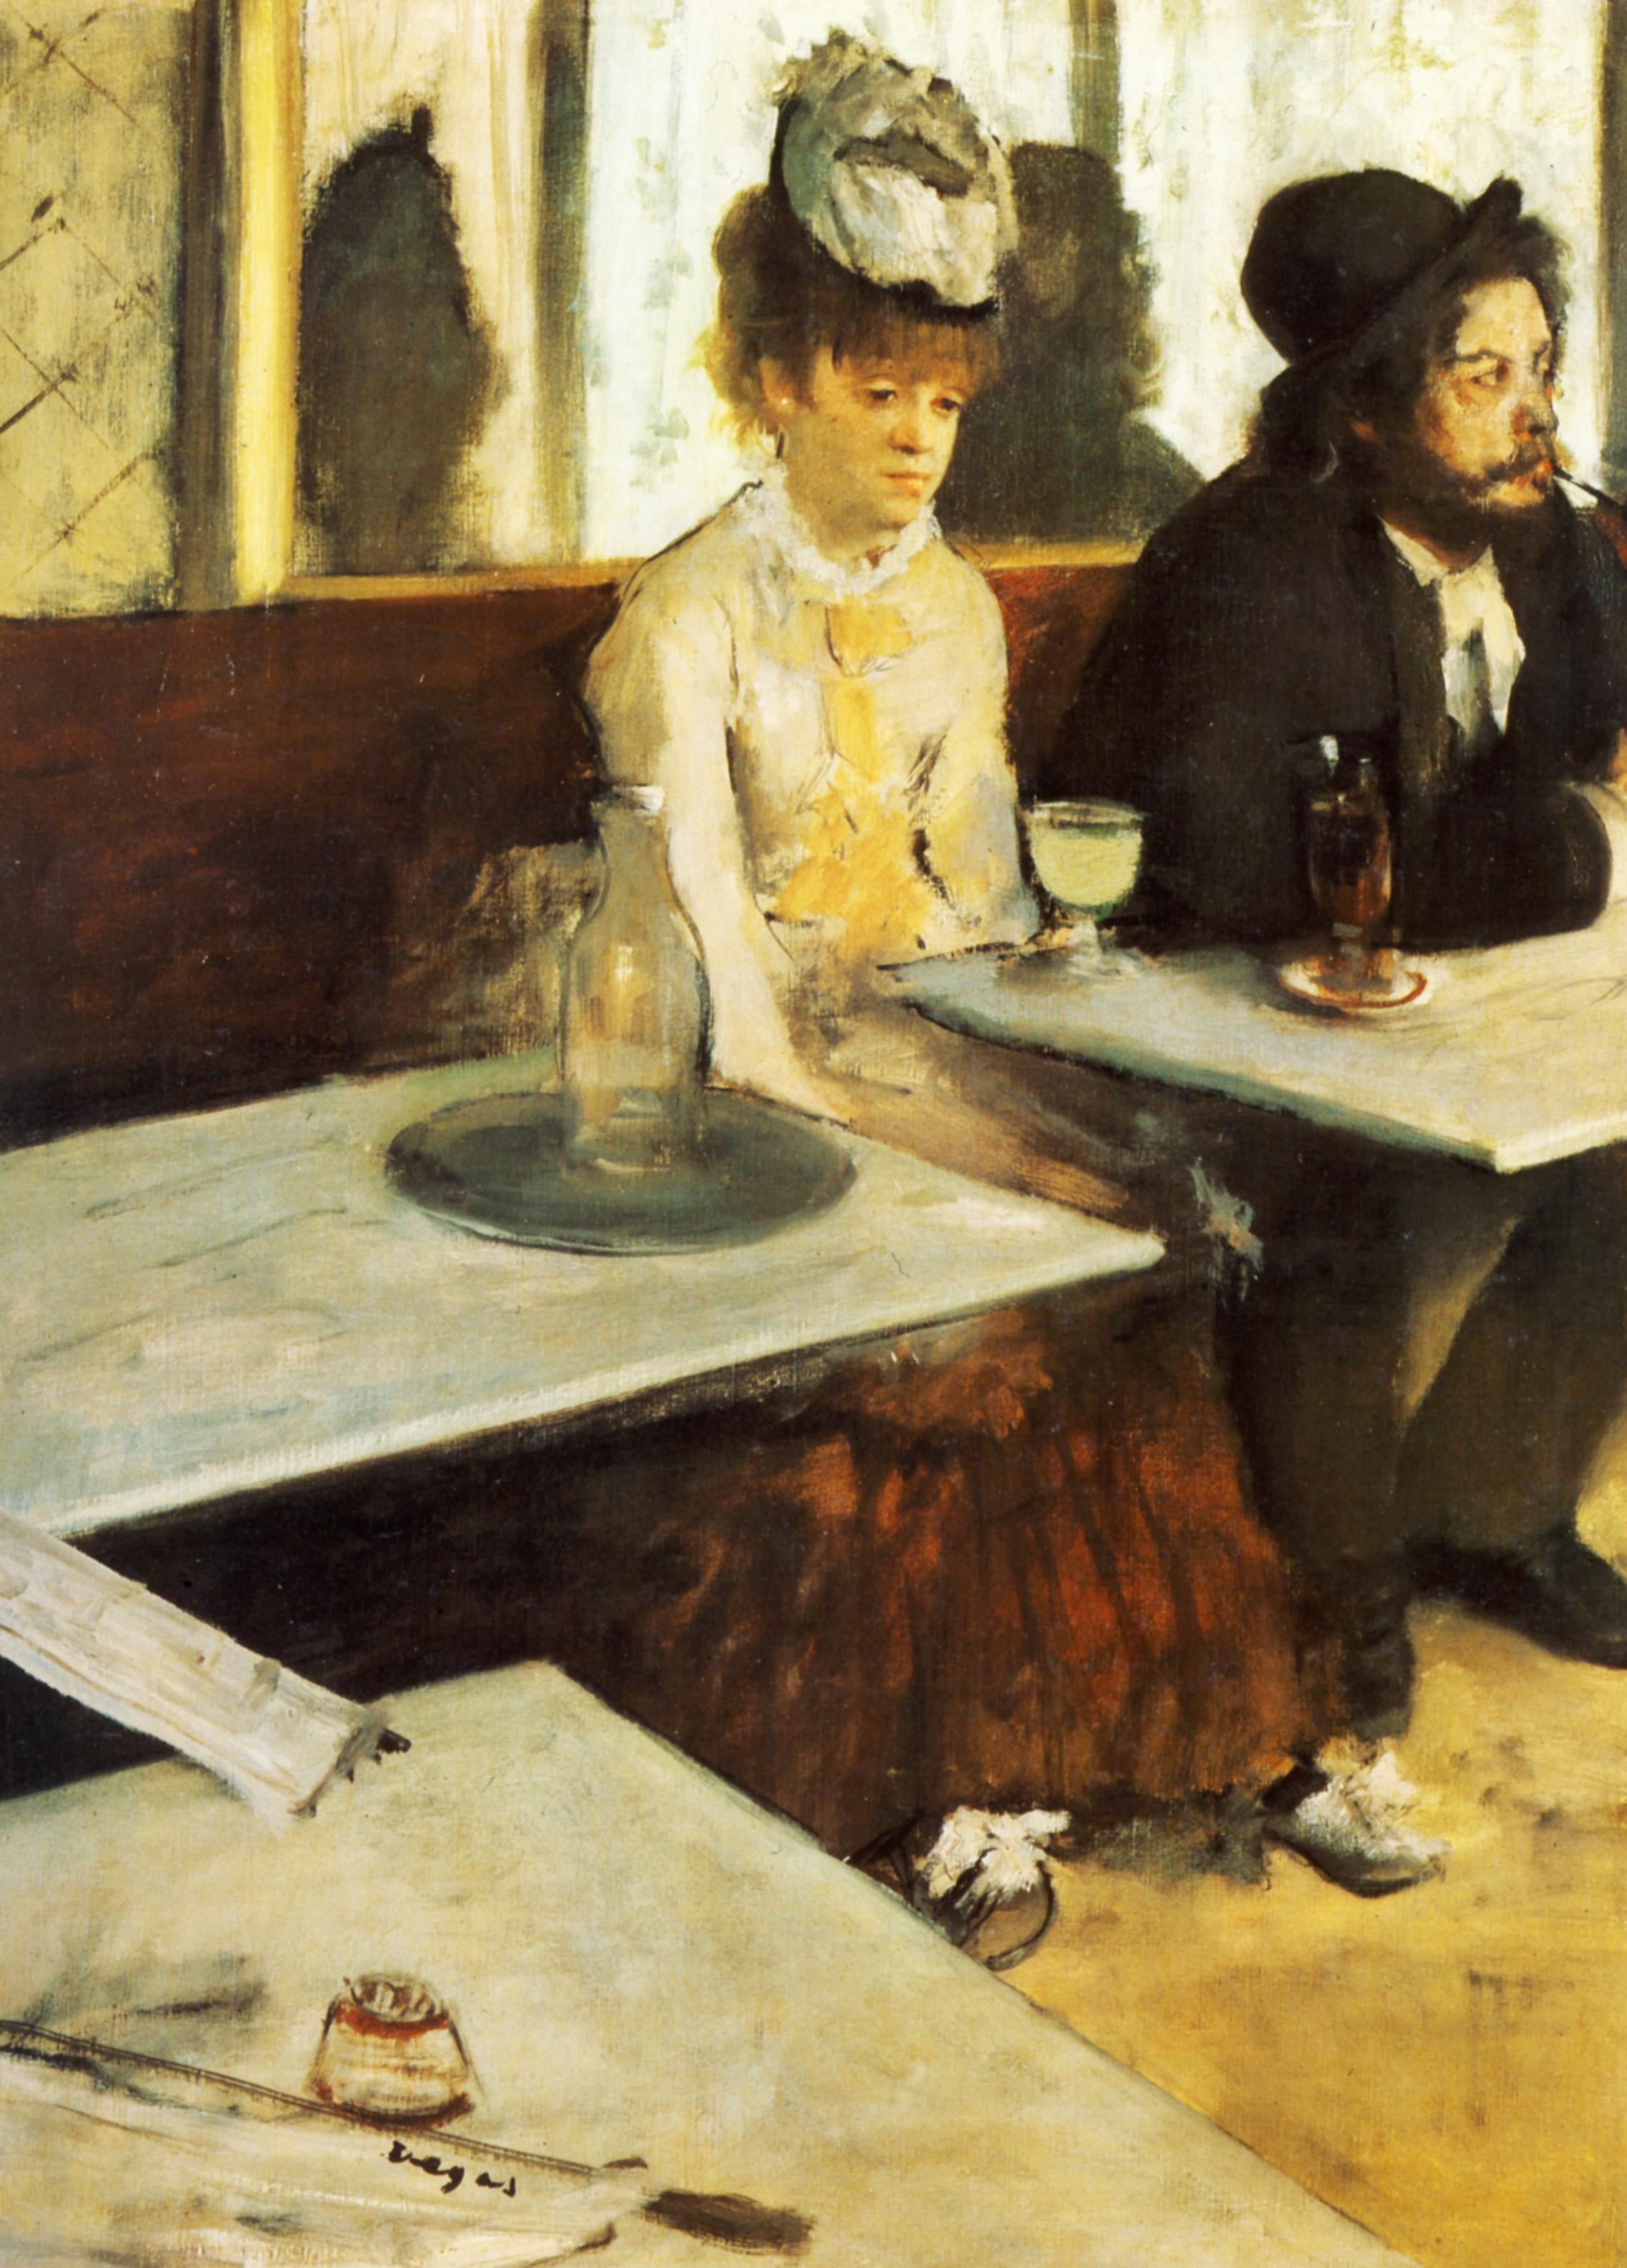 Degas, The Absinth Drinker (1867)